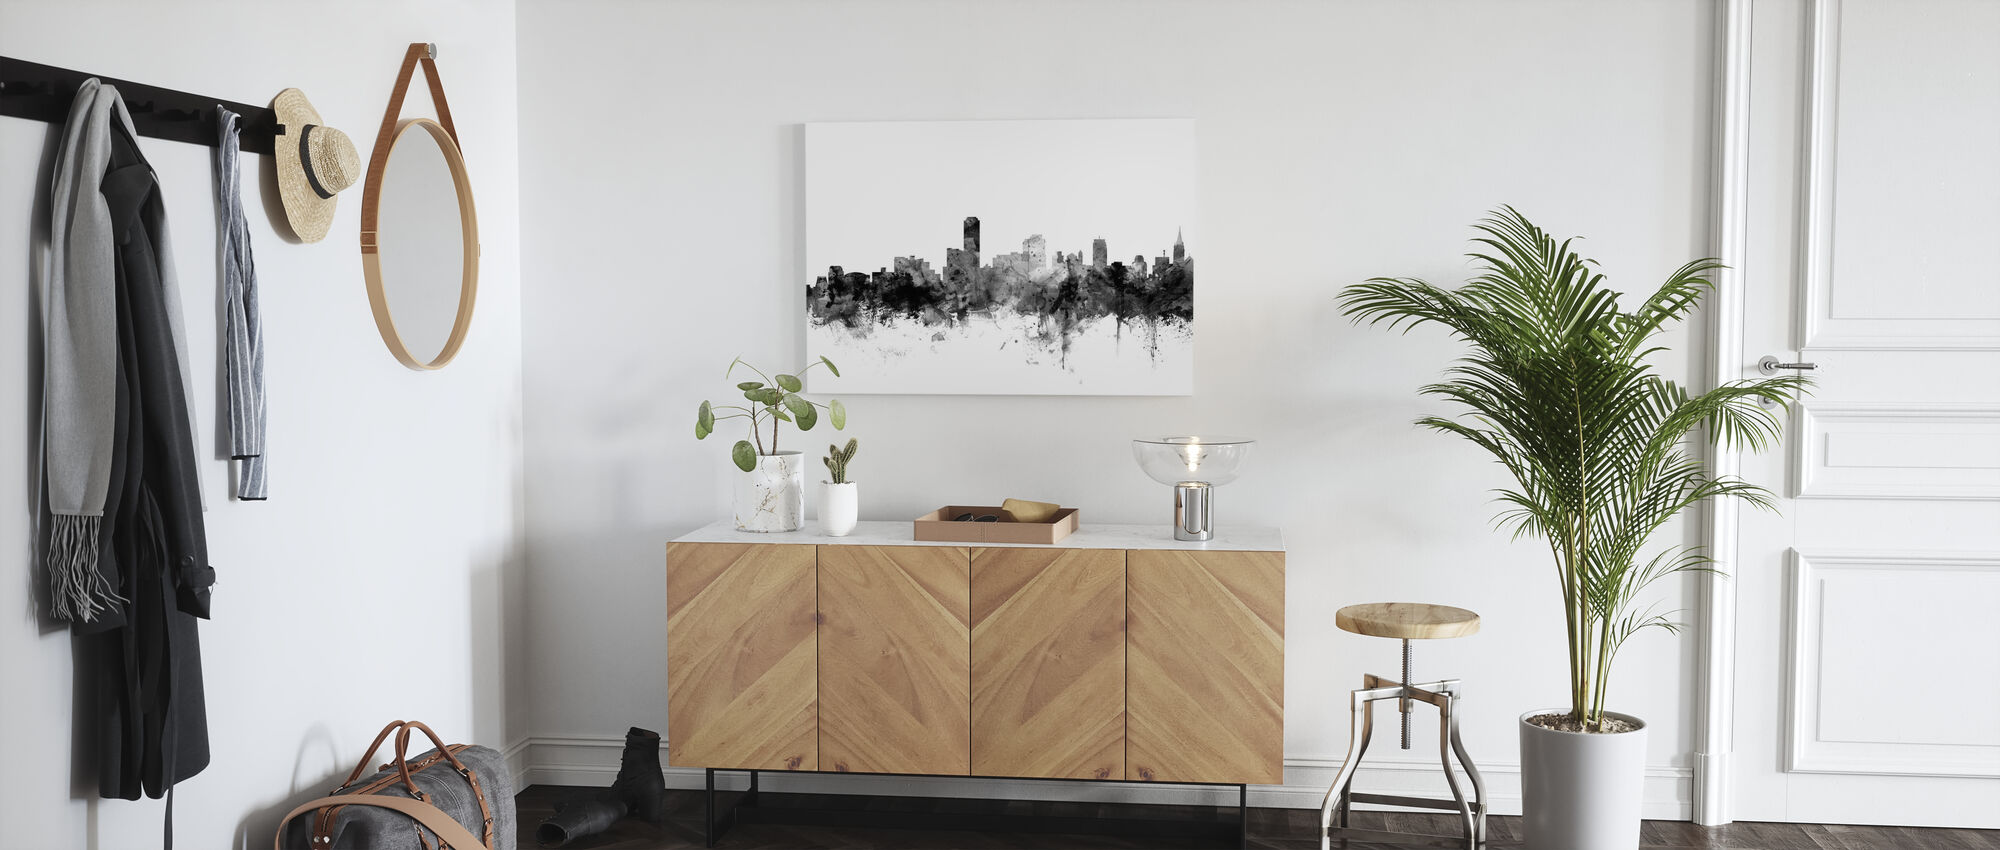 Adelaide Australien Skyline Svart - Canvastavla - Hall